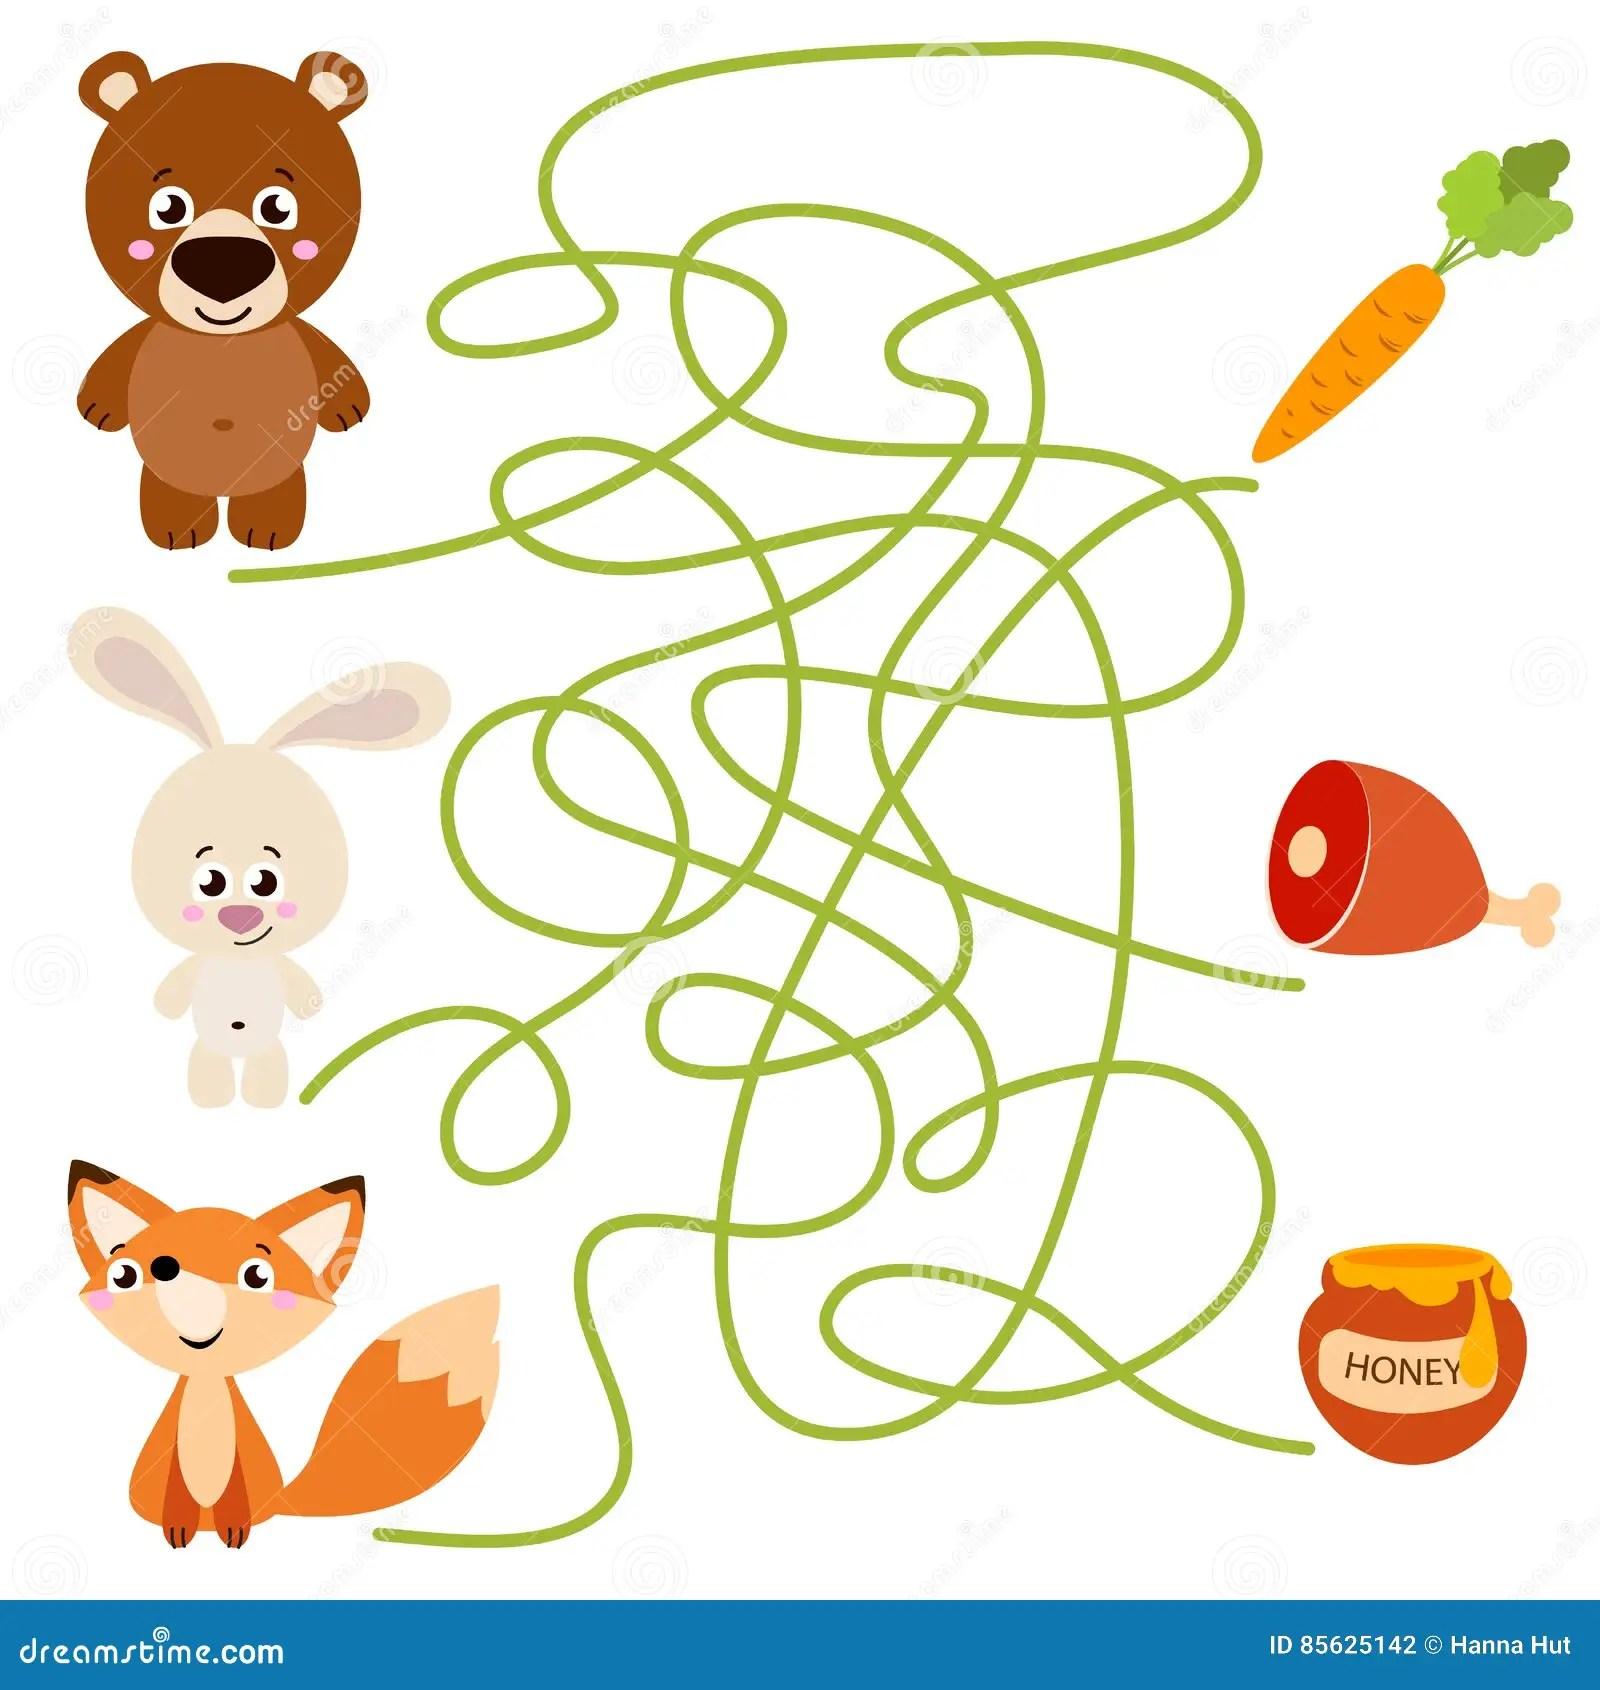 Cute Animal Educational Maze Game Stock Vector